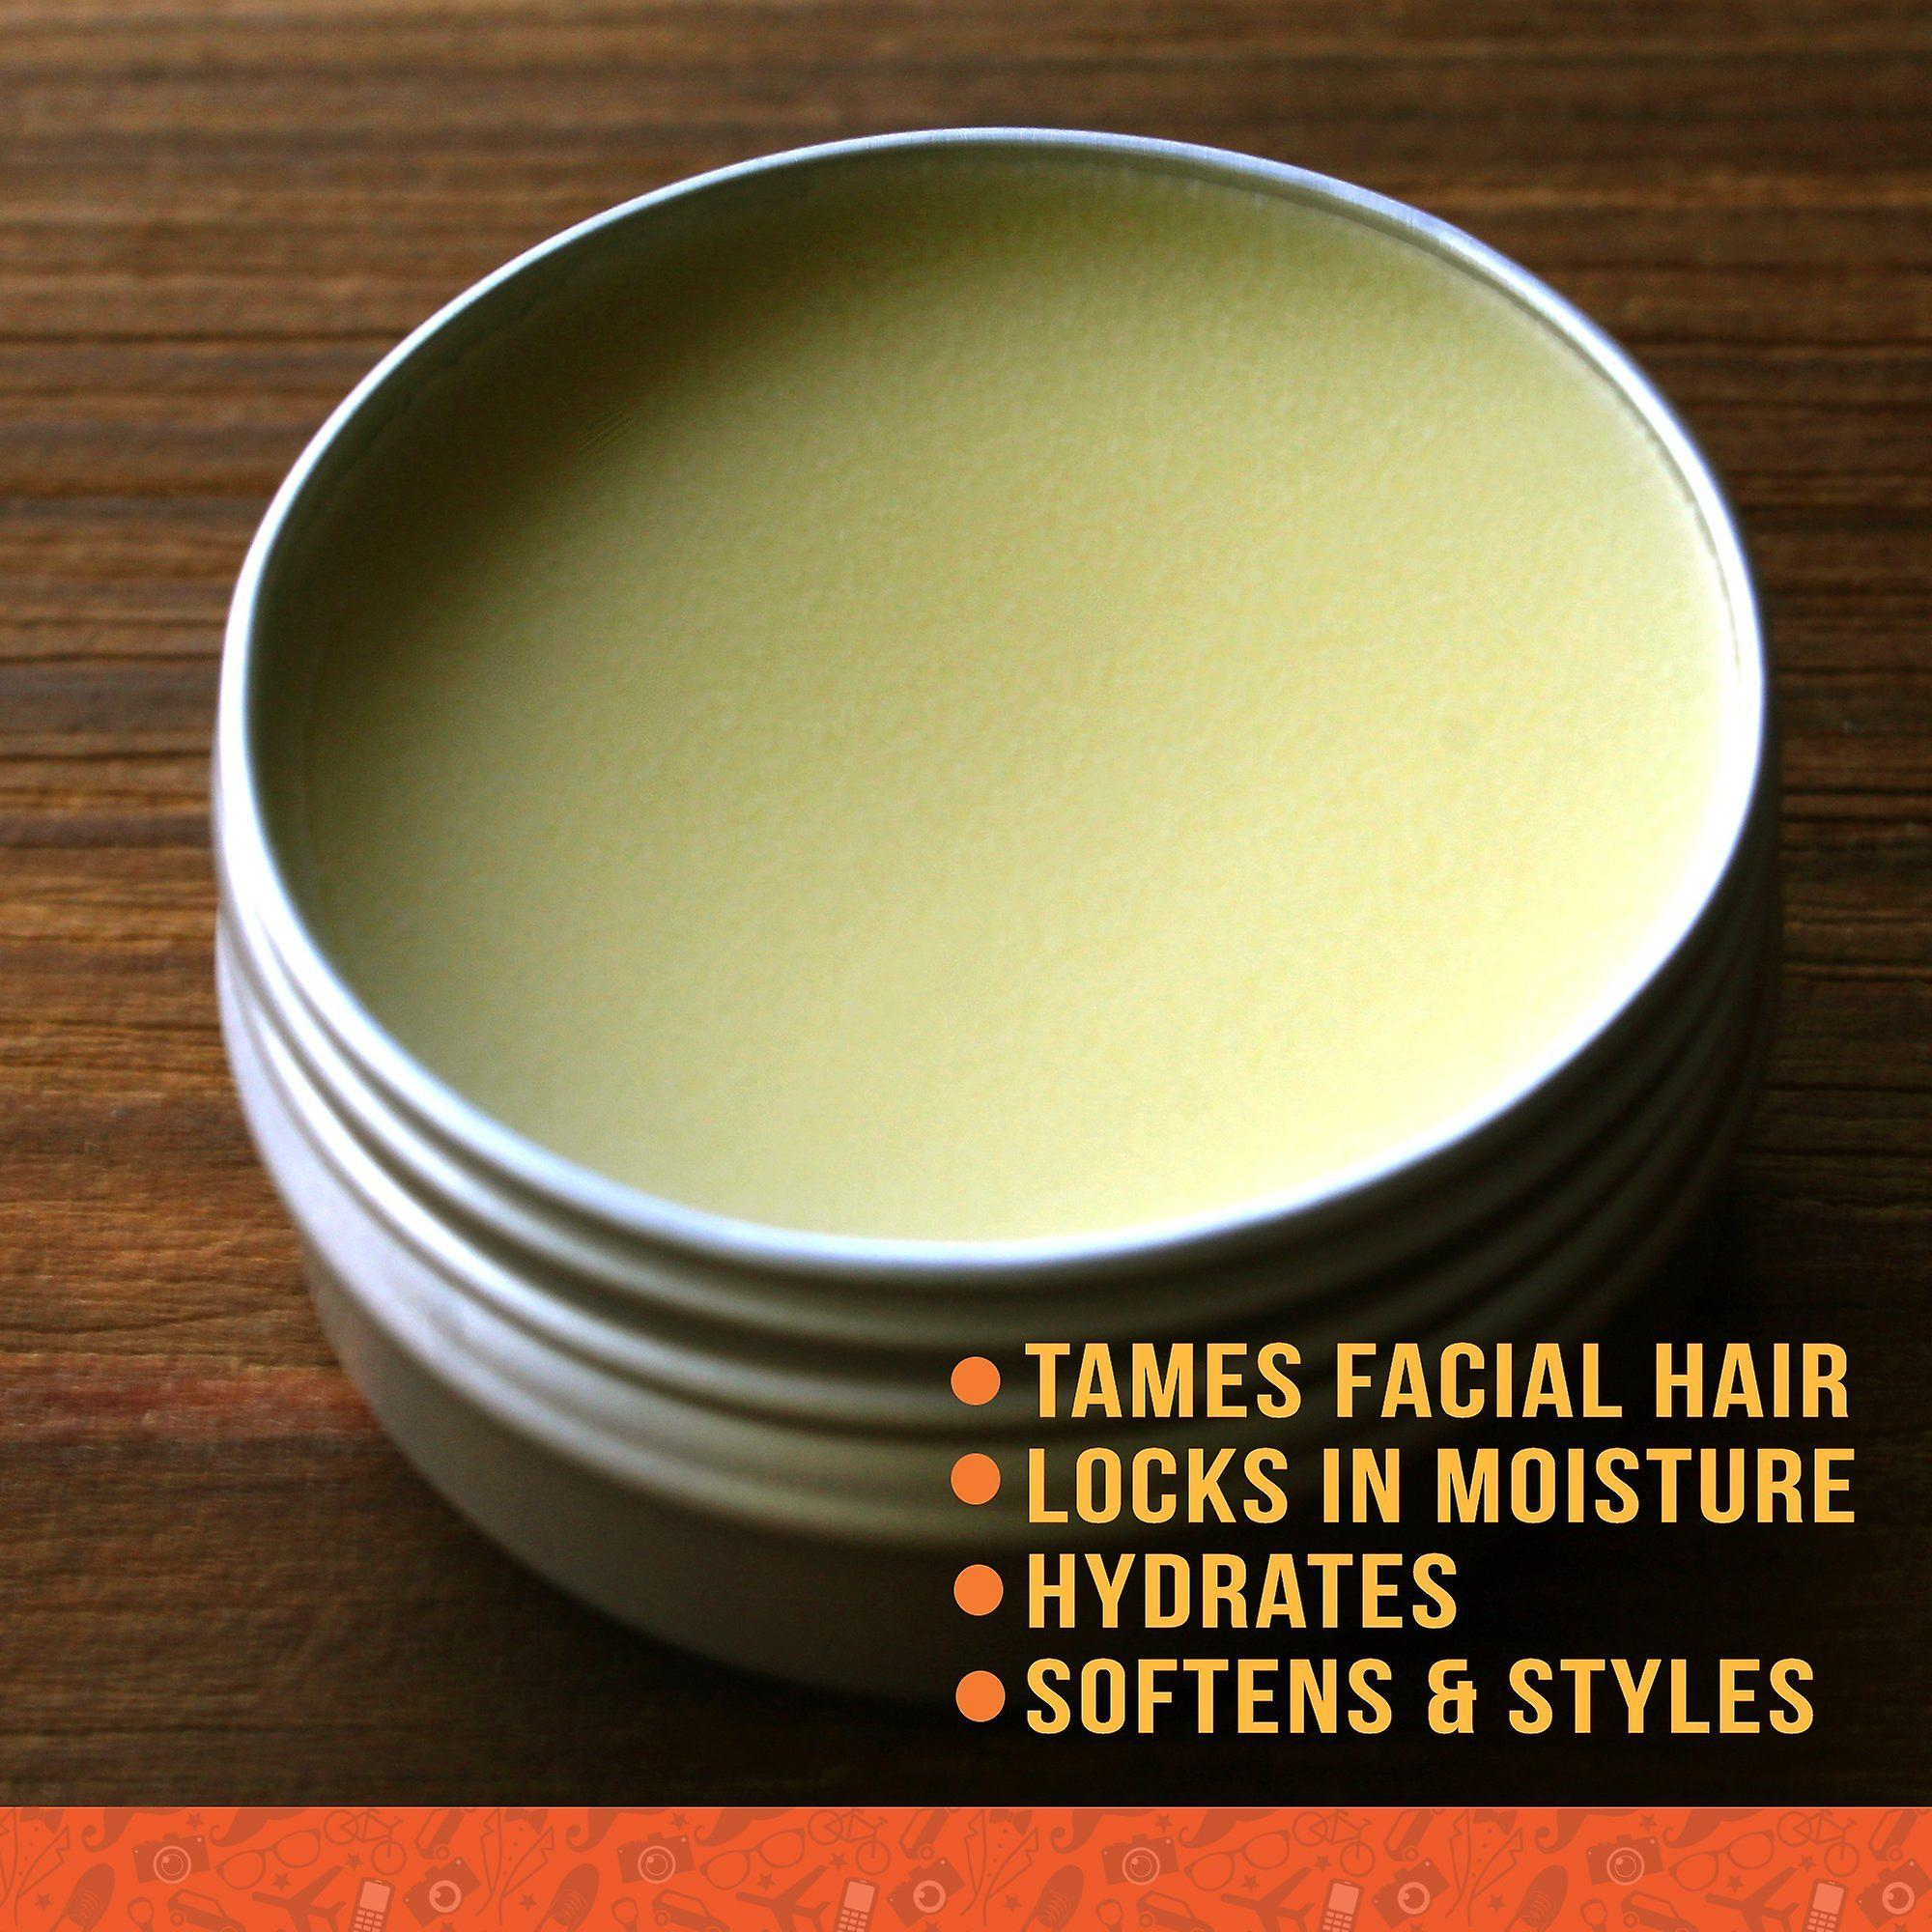 Xl beard maintenance grooming kit